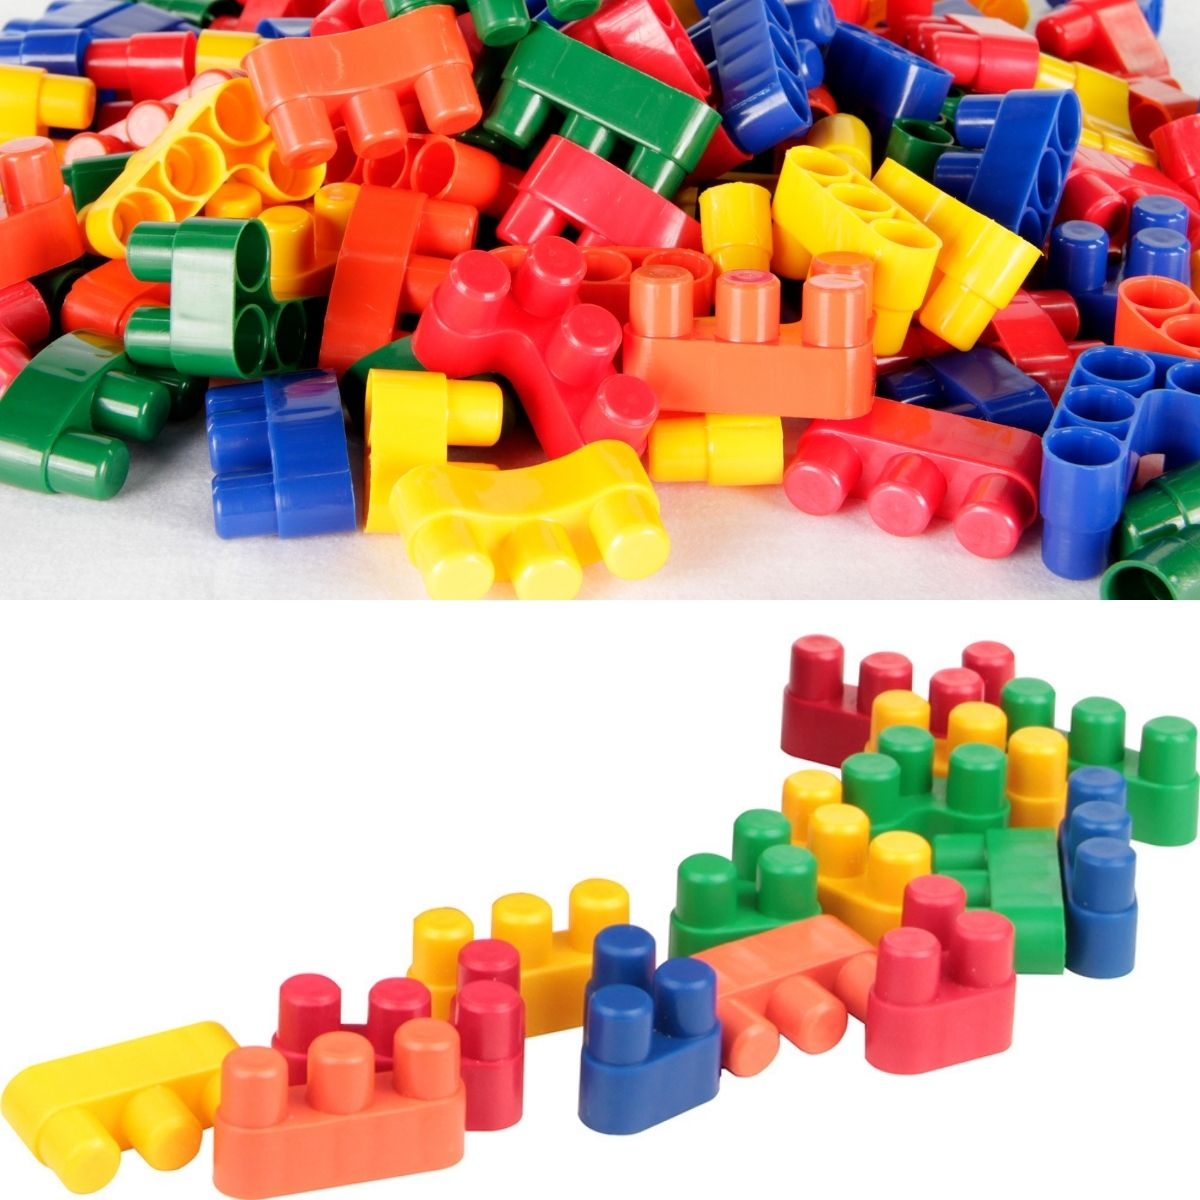 Brinquedo Educativo Conectando Formas - 150 peças